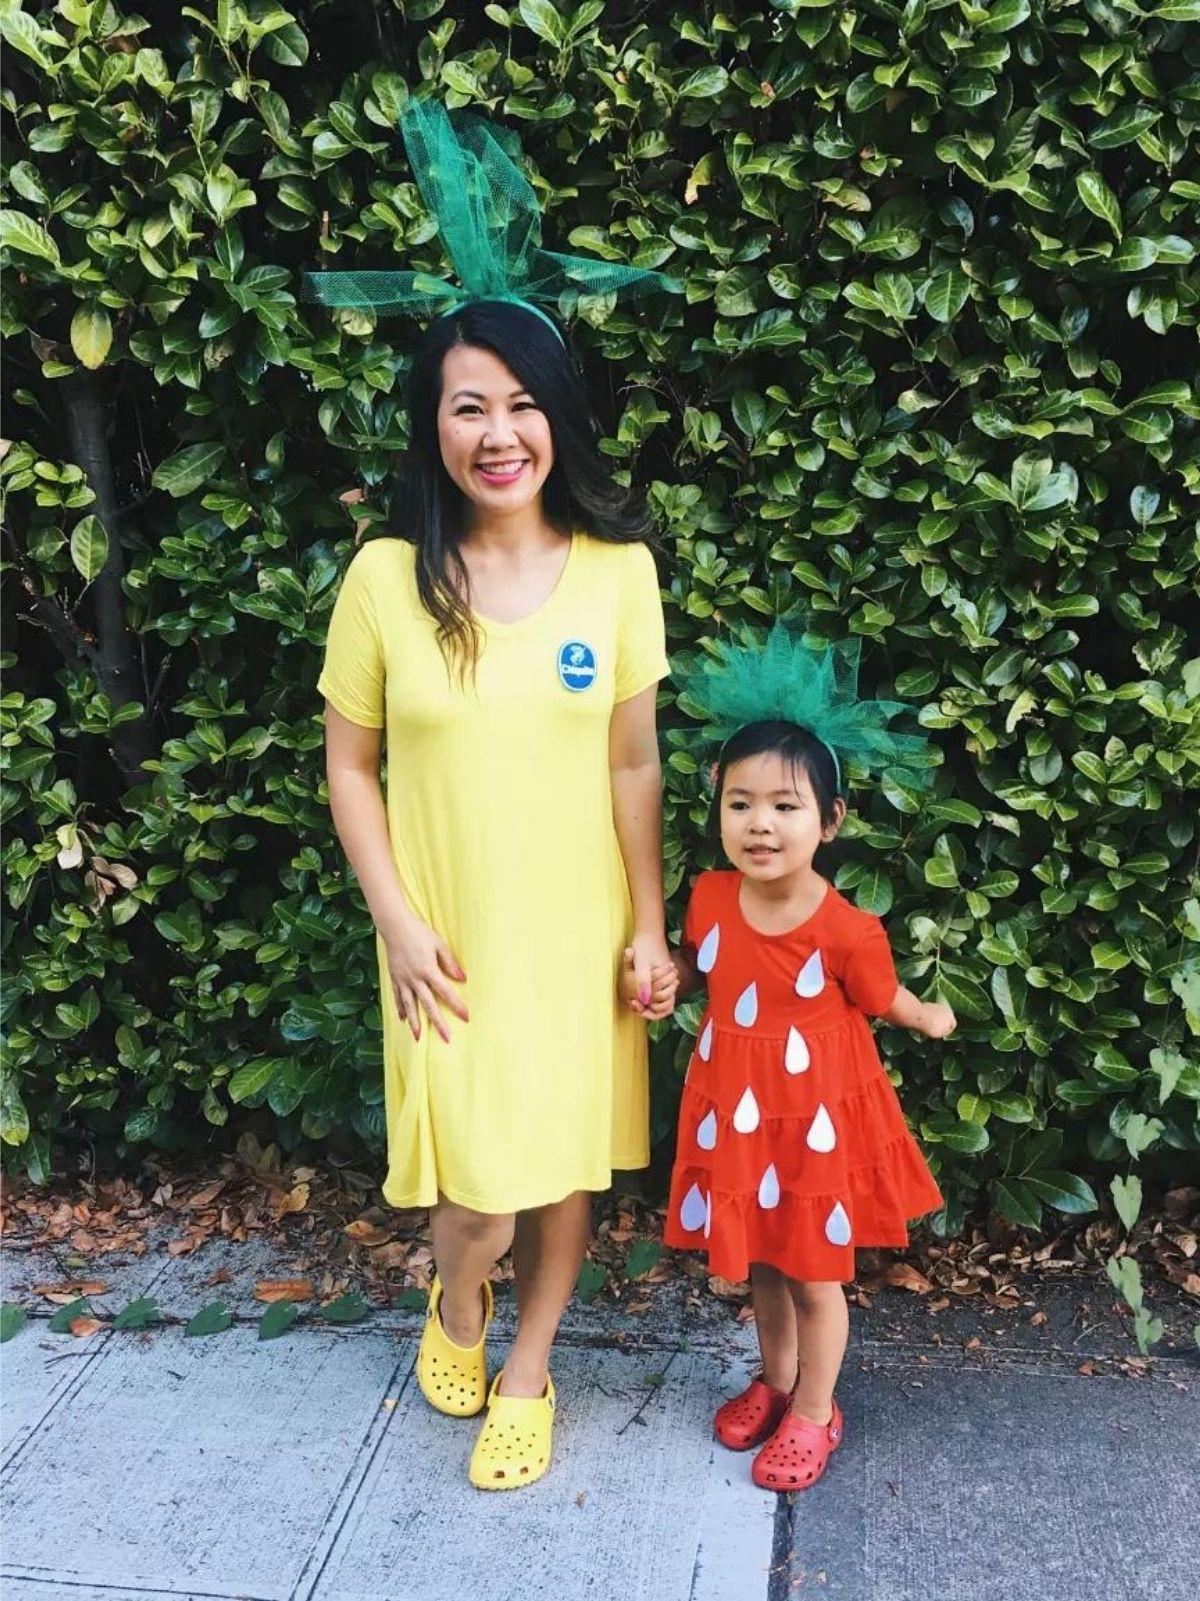 Banana and Strawberry costumes